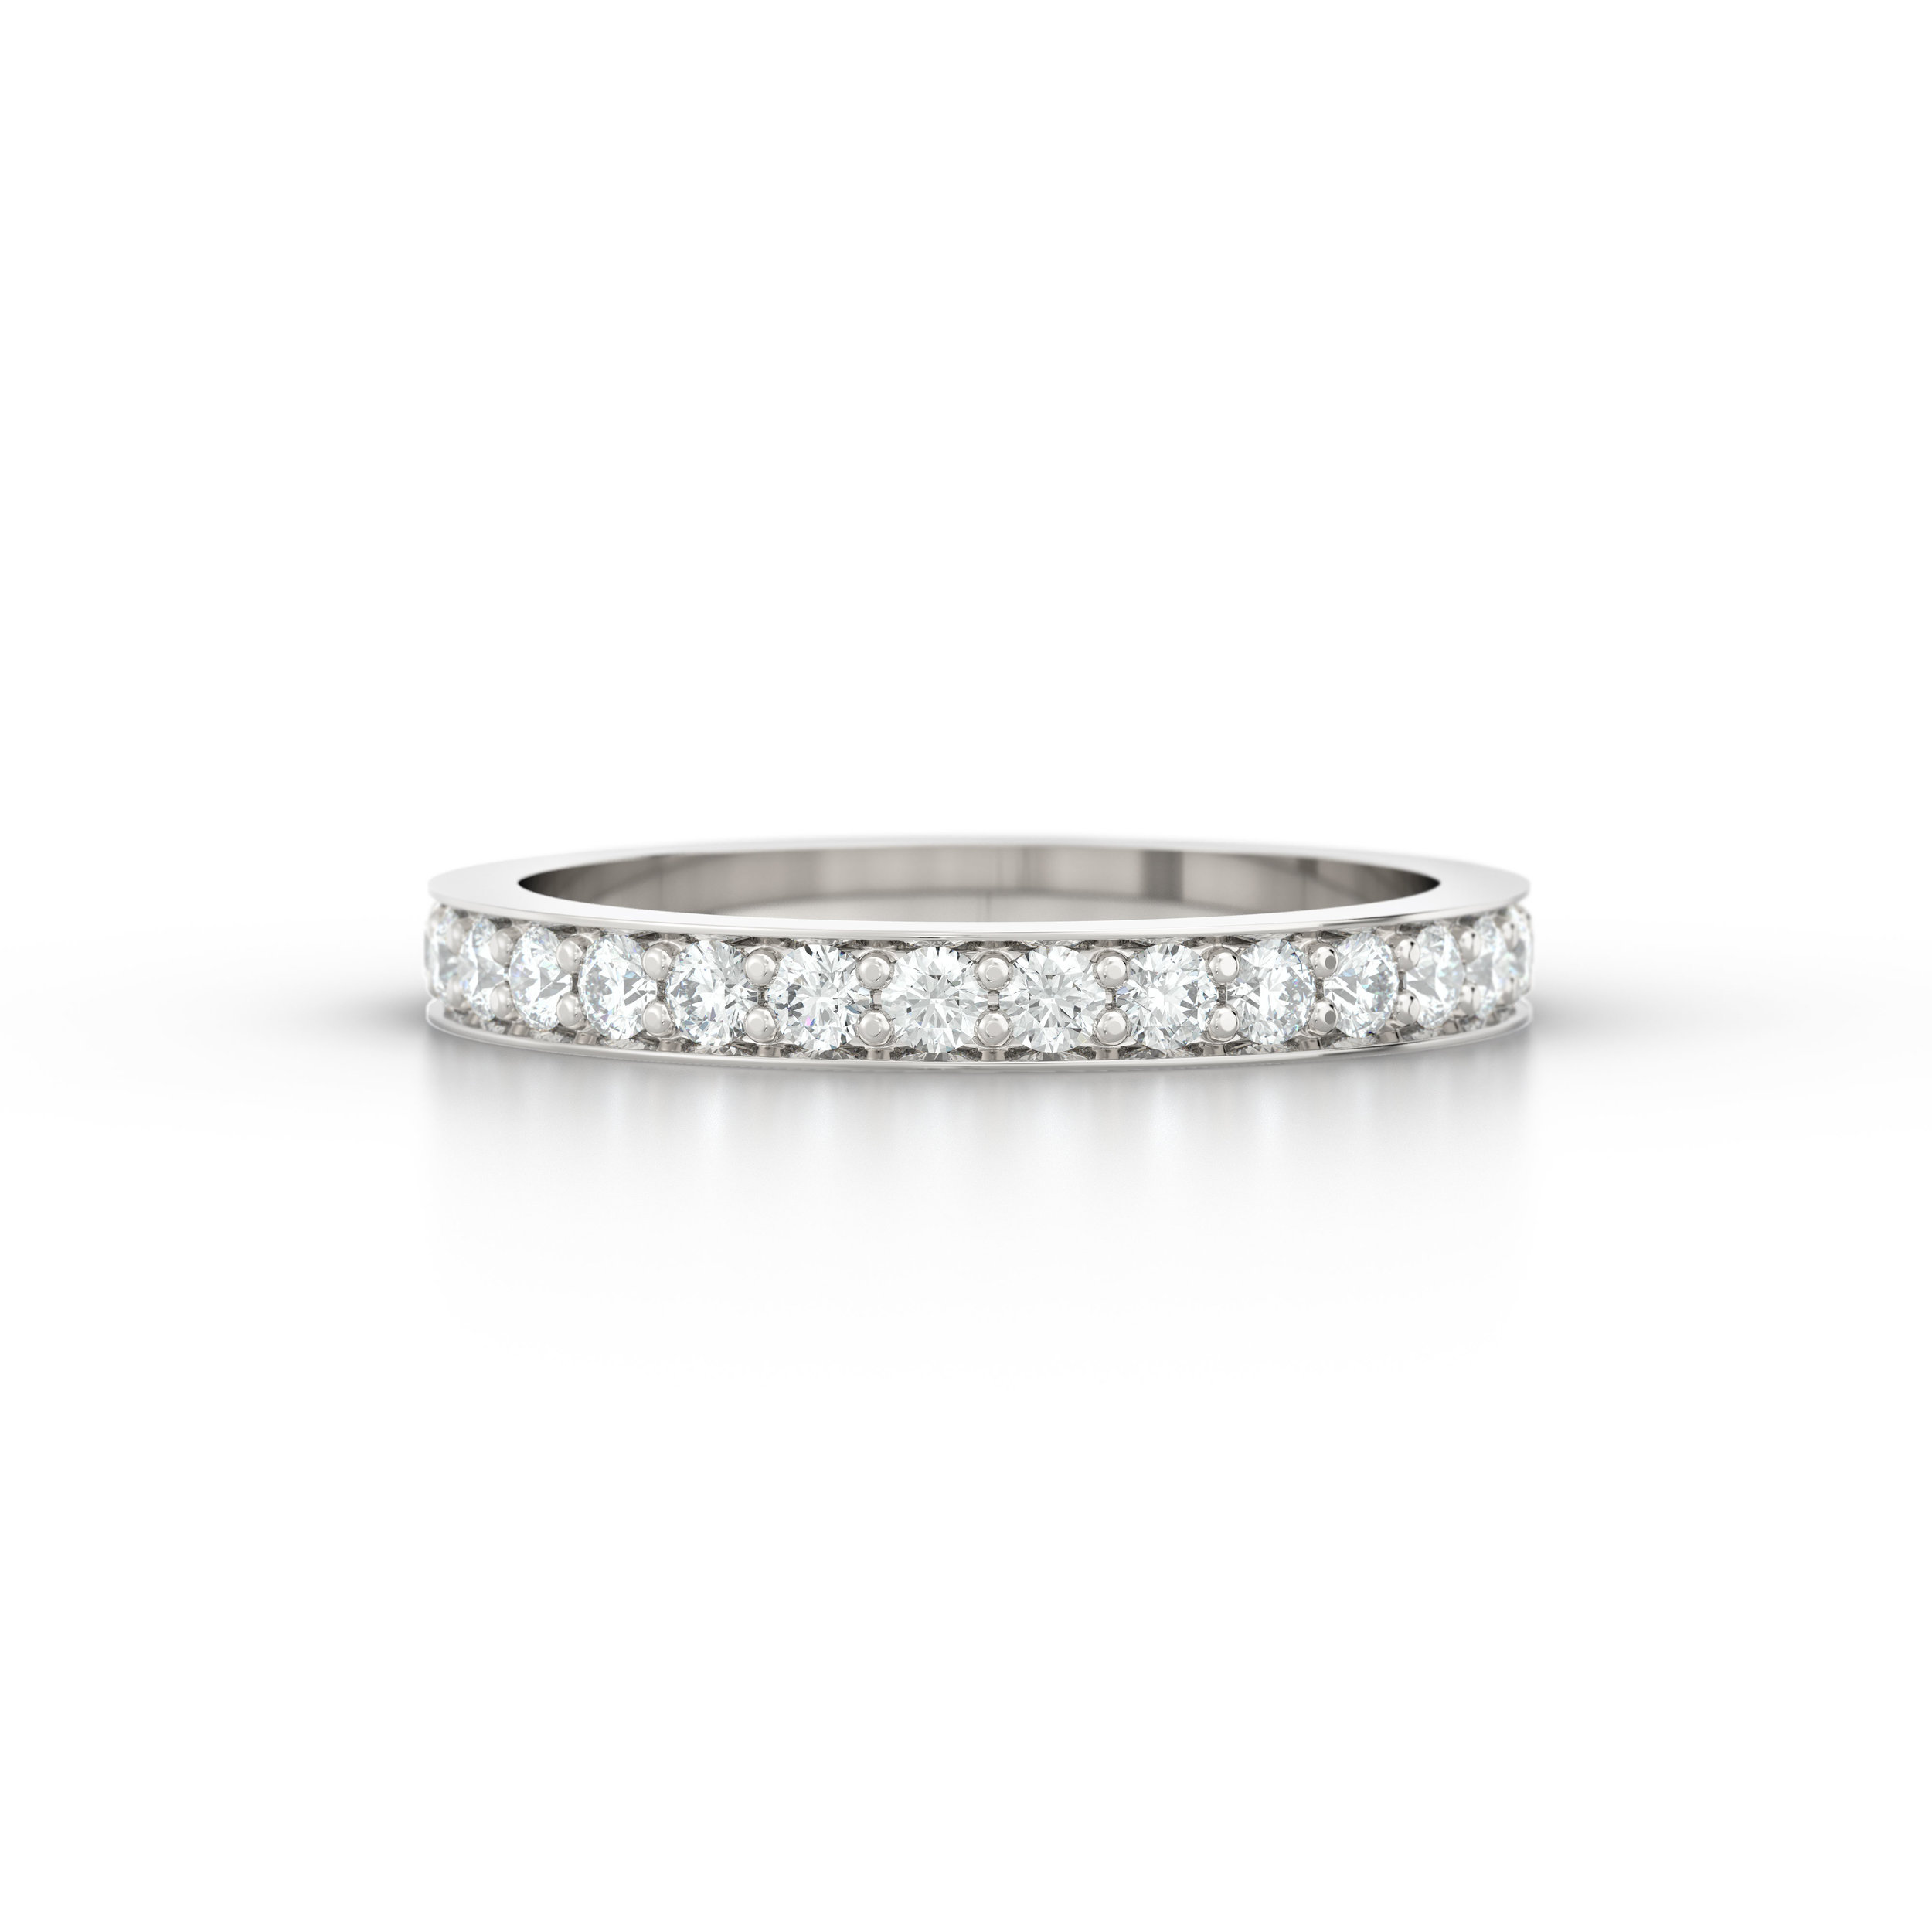 Pave Set Eternity Ring | Hatton Garden Jewellers